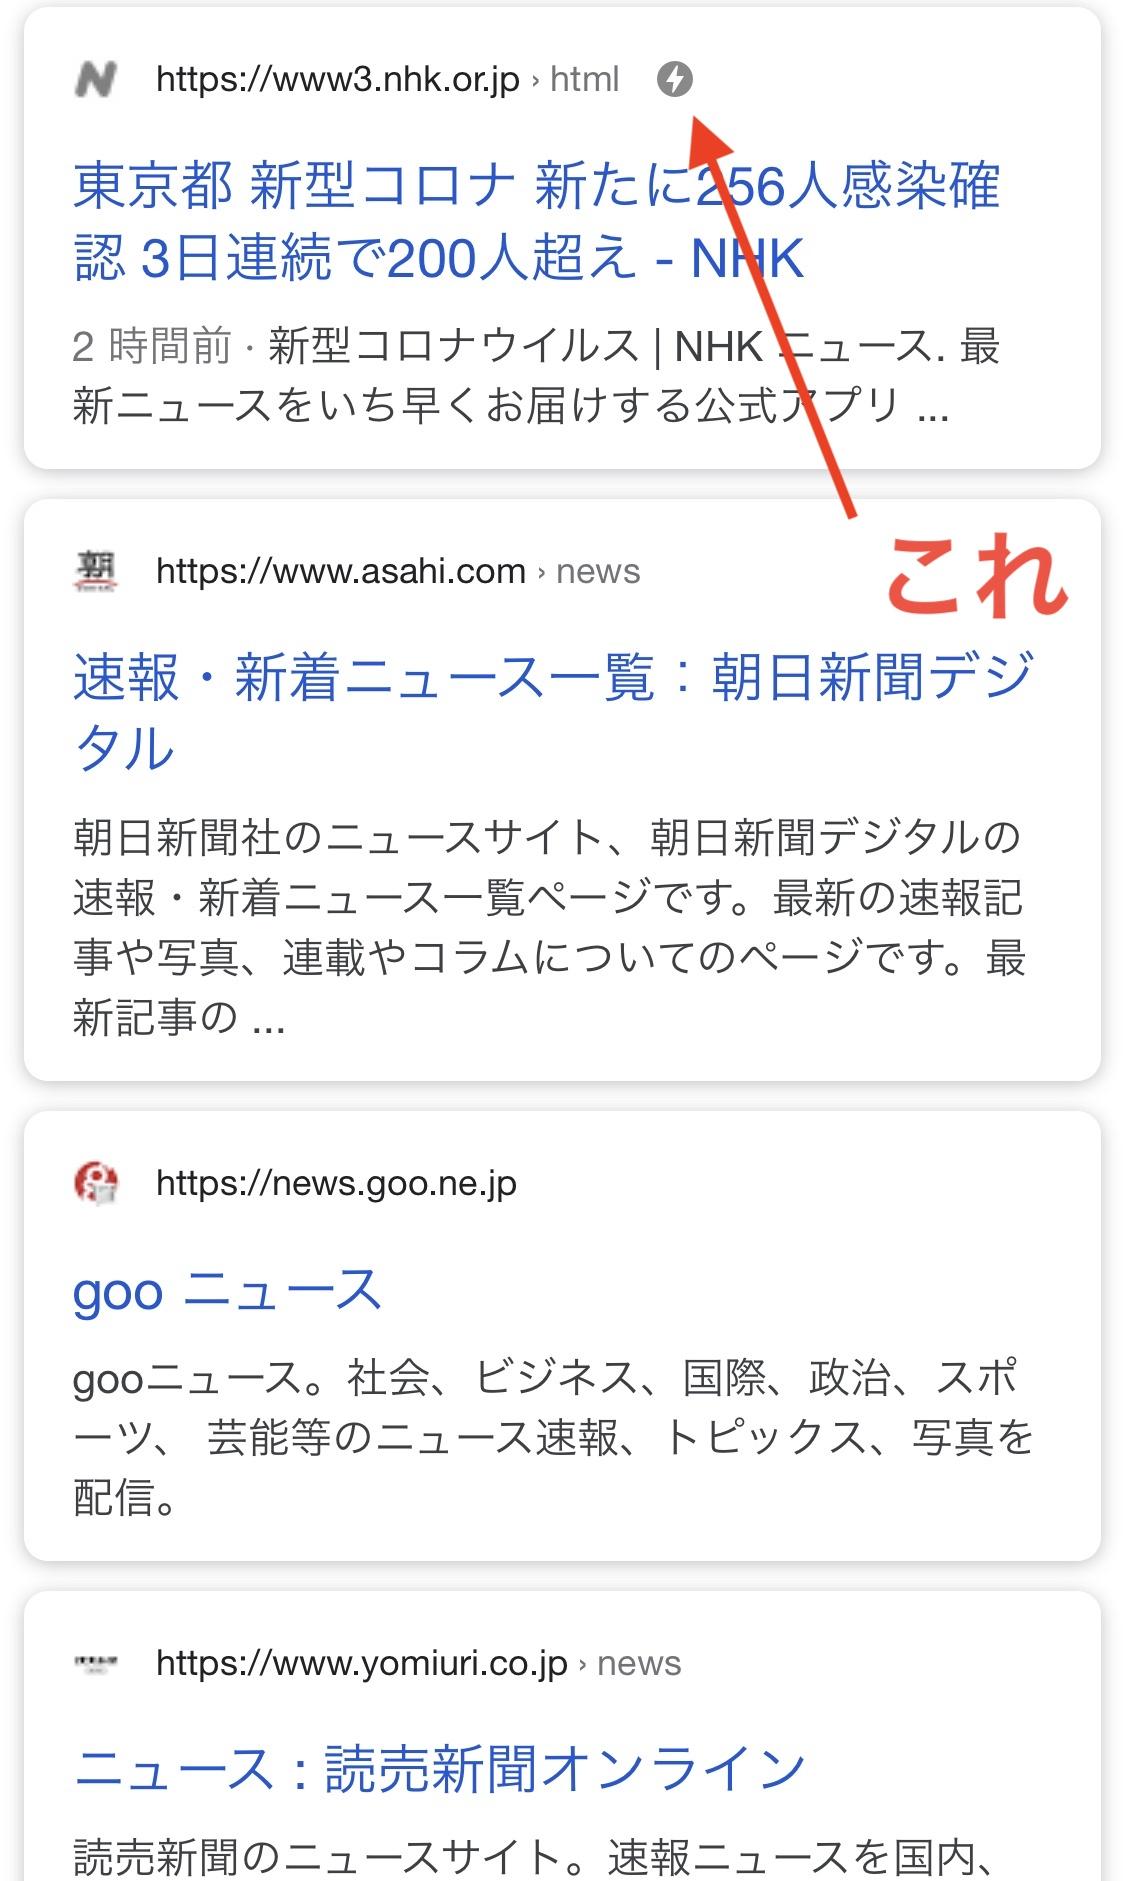 https://res.cloudinary.com/dw86z2fnr/image/upload/v1620382980/titanicrising.jp/about-amp/IMG_1551_lqanm9.jpg